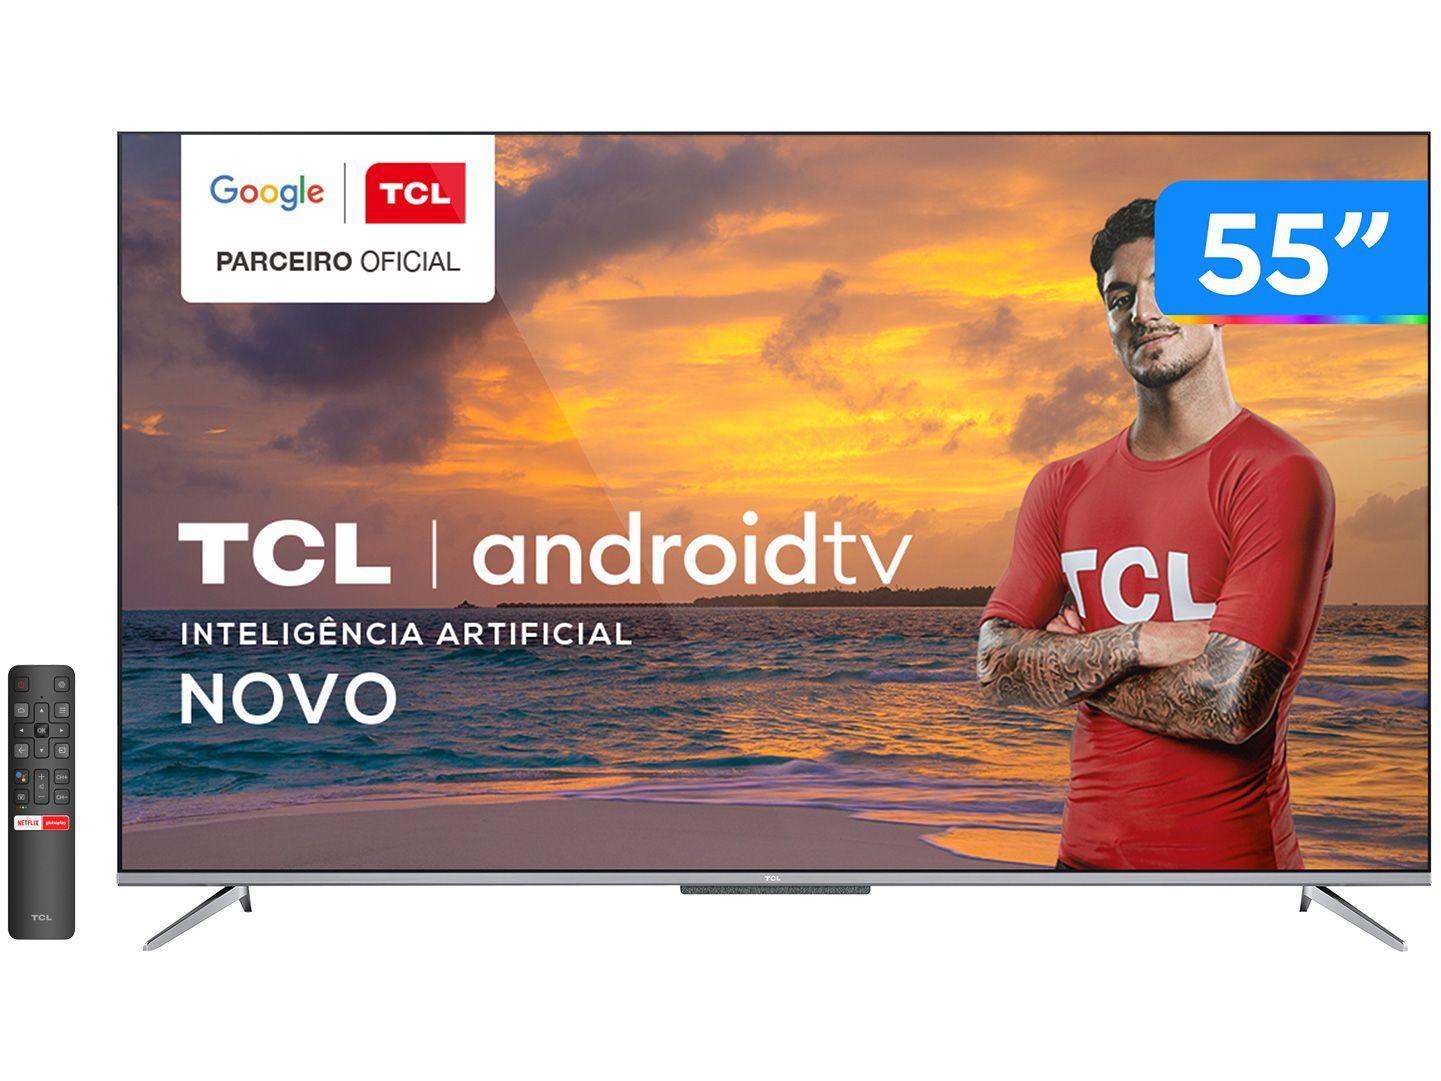 Smart TV 4K UHD LED 55 TCL 55P715 Android Wi-Fi - Bluetooth 3 HDMI 2 USB